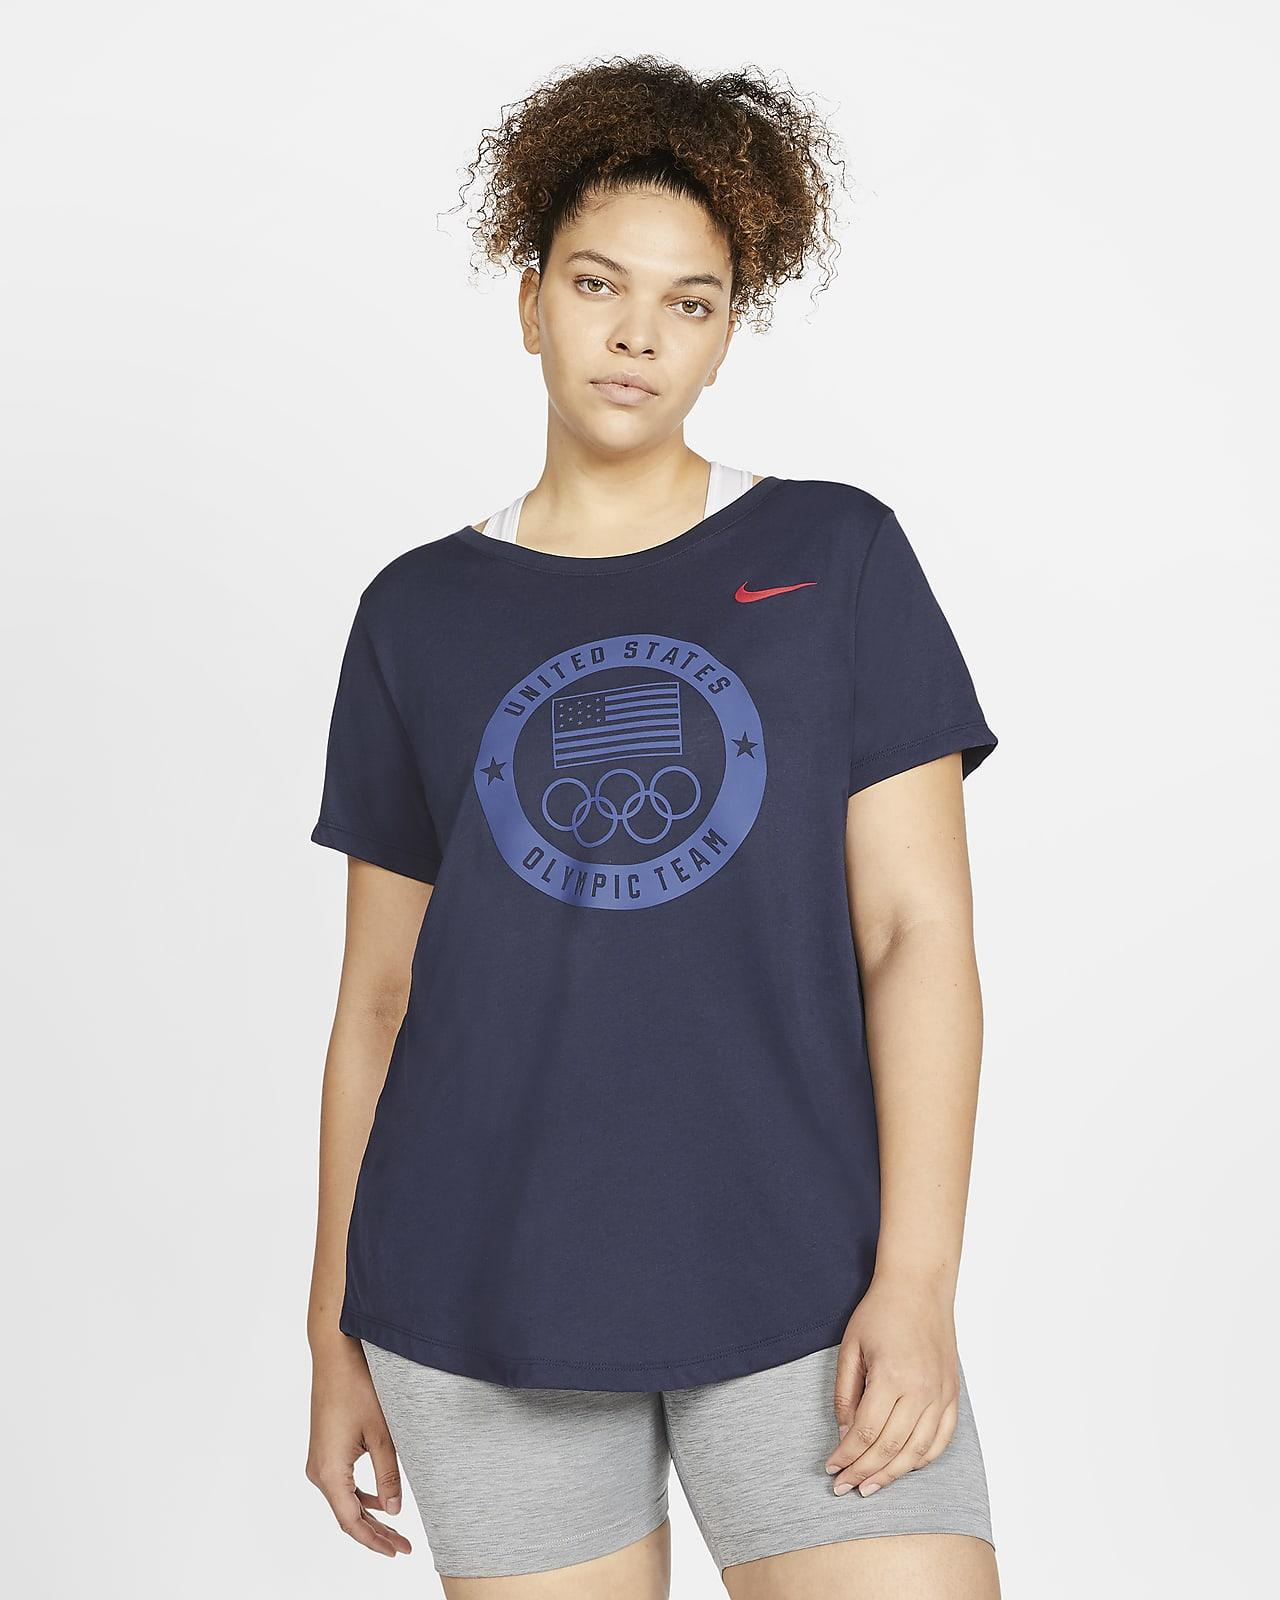 Nike Team USA Women's Training T-Shirt (Plus Size)